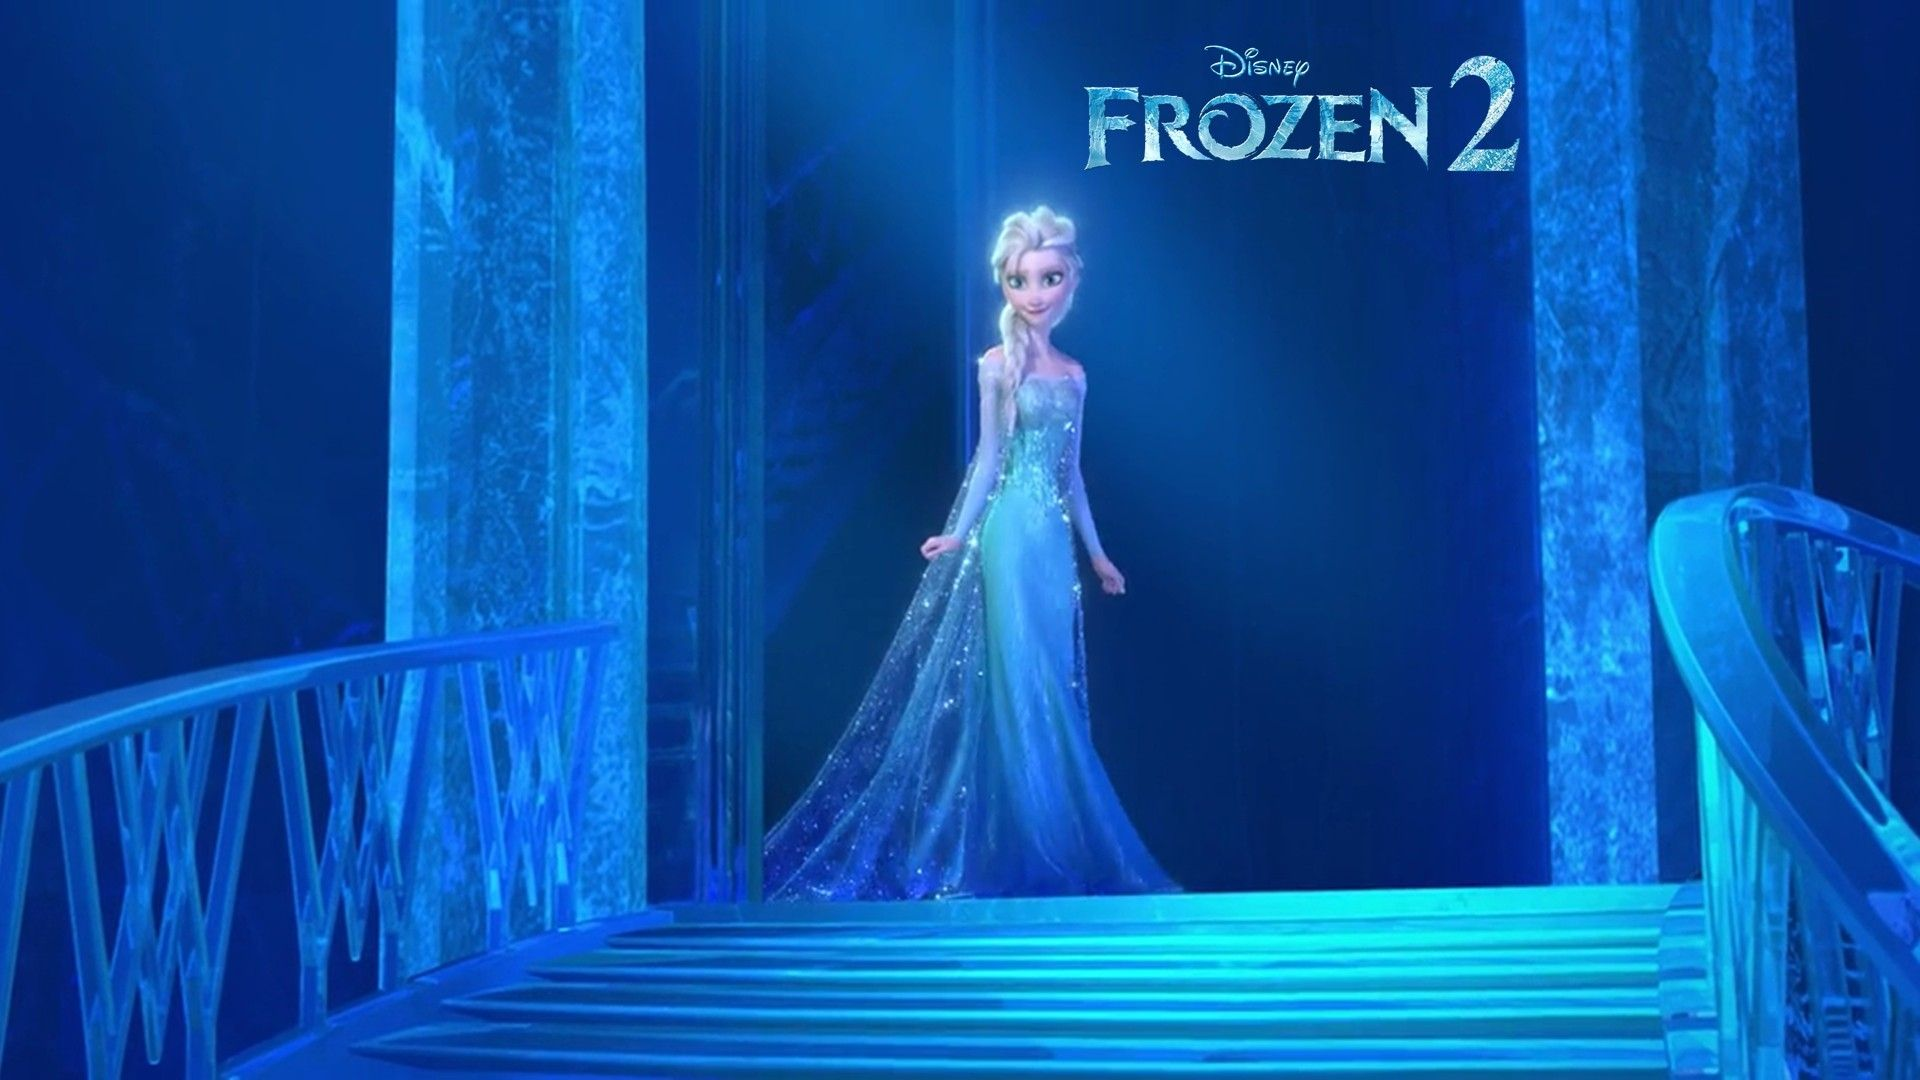 Frozen HD Wallpapers Backgrounds Wallpaper HD Wallpapers